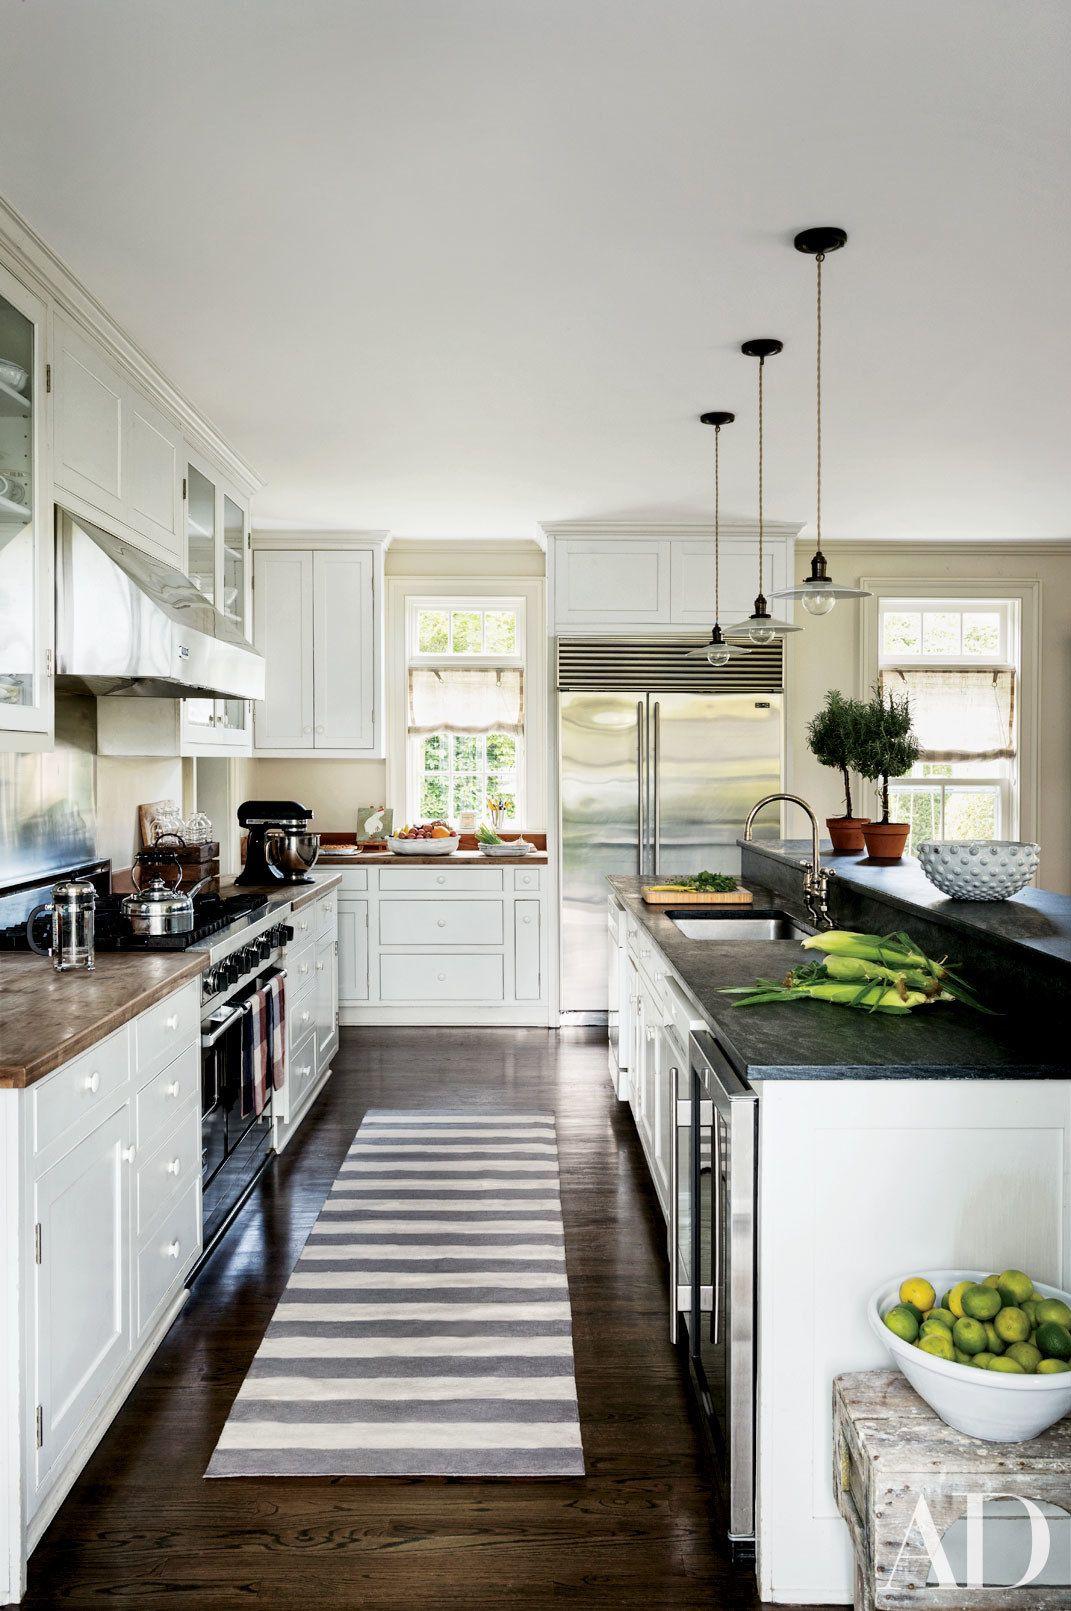 25 black countertops to inspire your kitchen renovation black kitchen countertops outdoor on kitchen decor black countertop id=18579